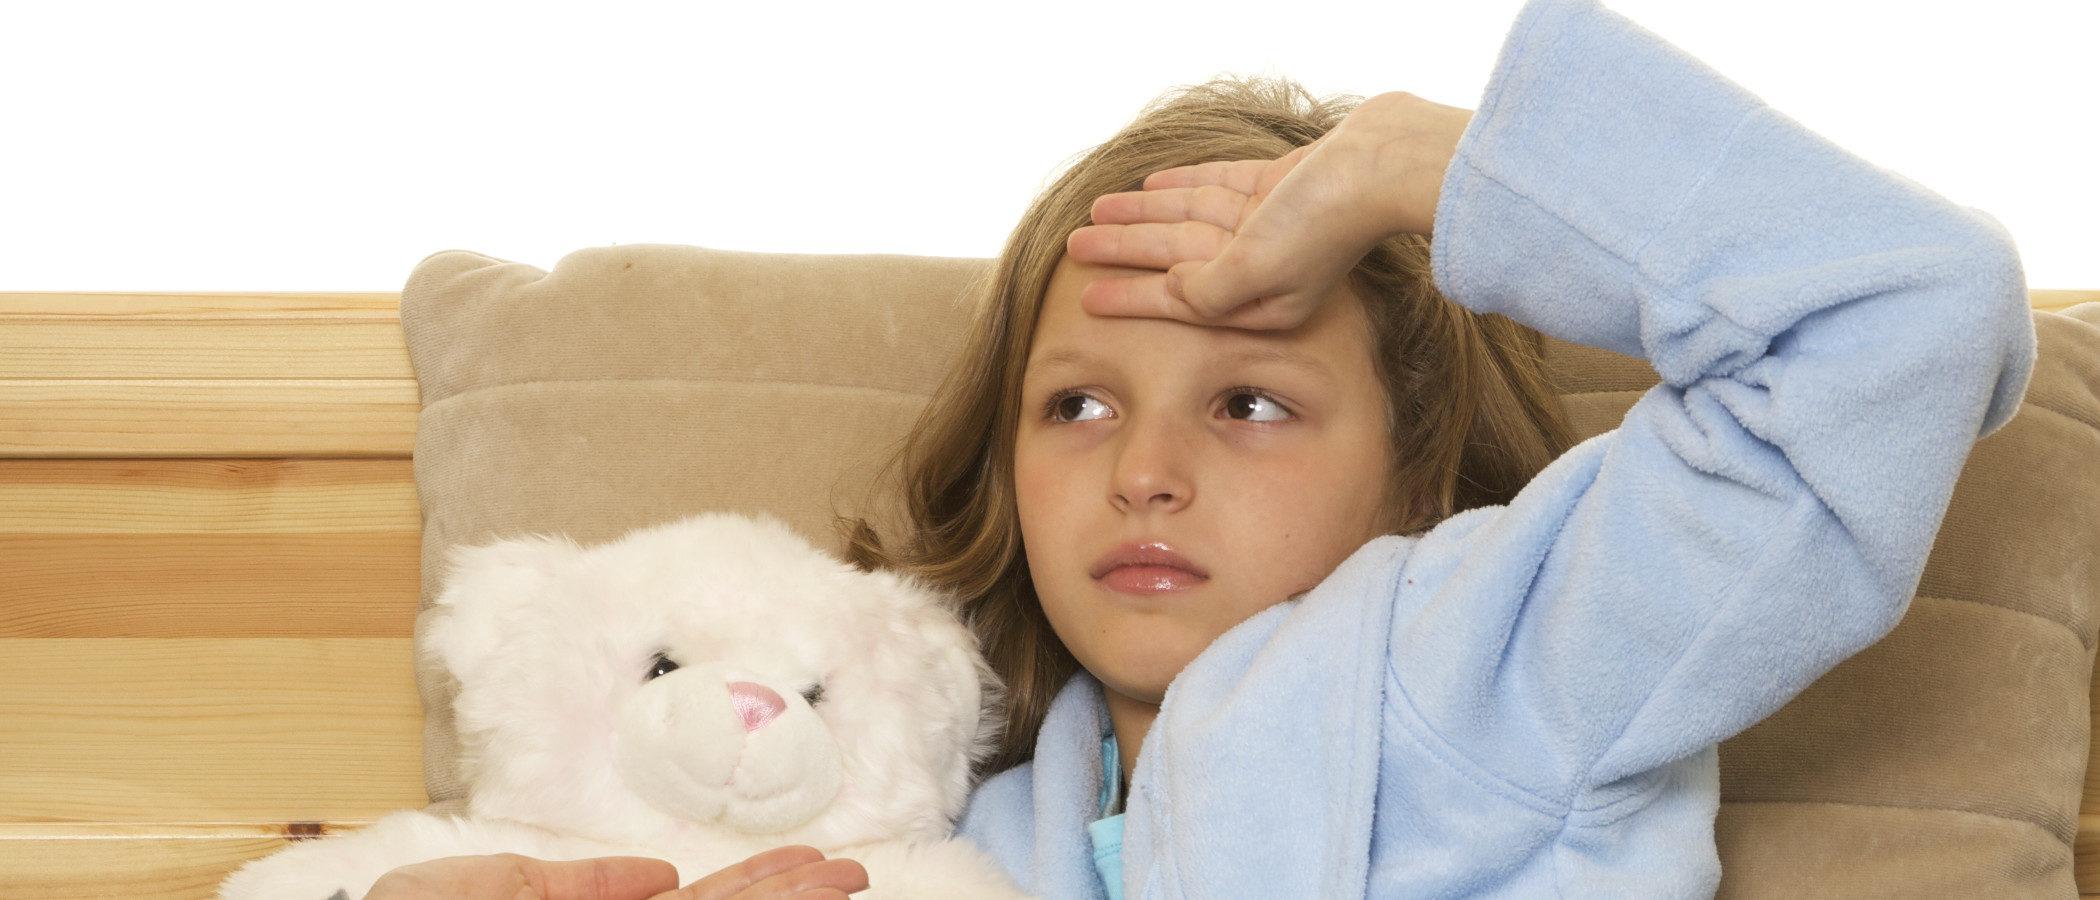 ¿Por qué se dejó de utilizar la aspirina infantil?